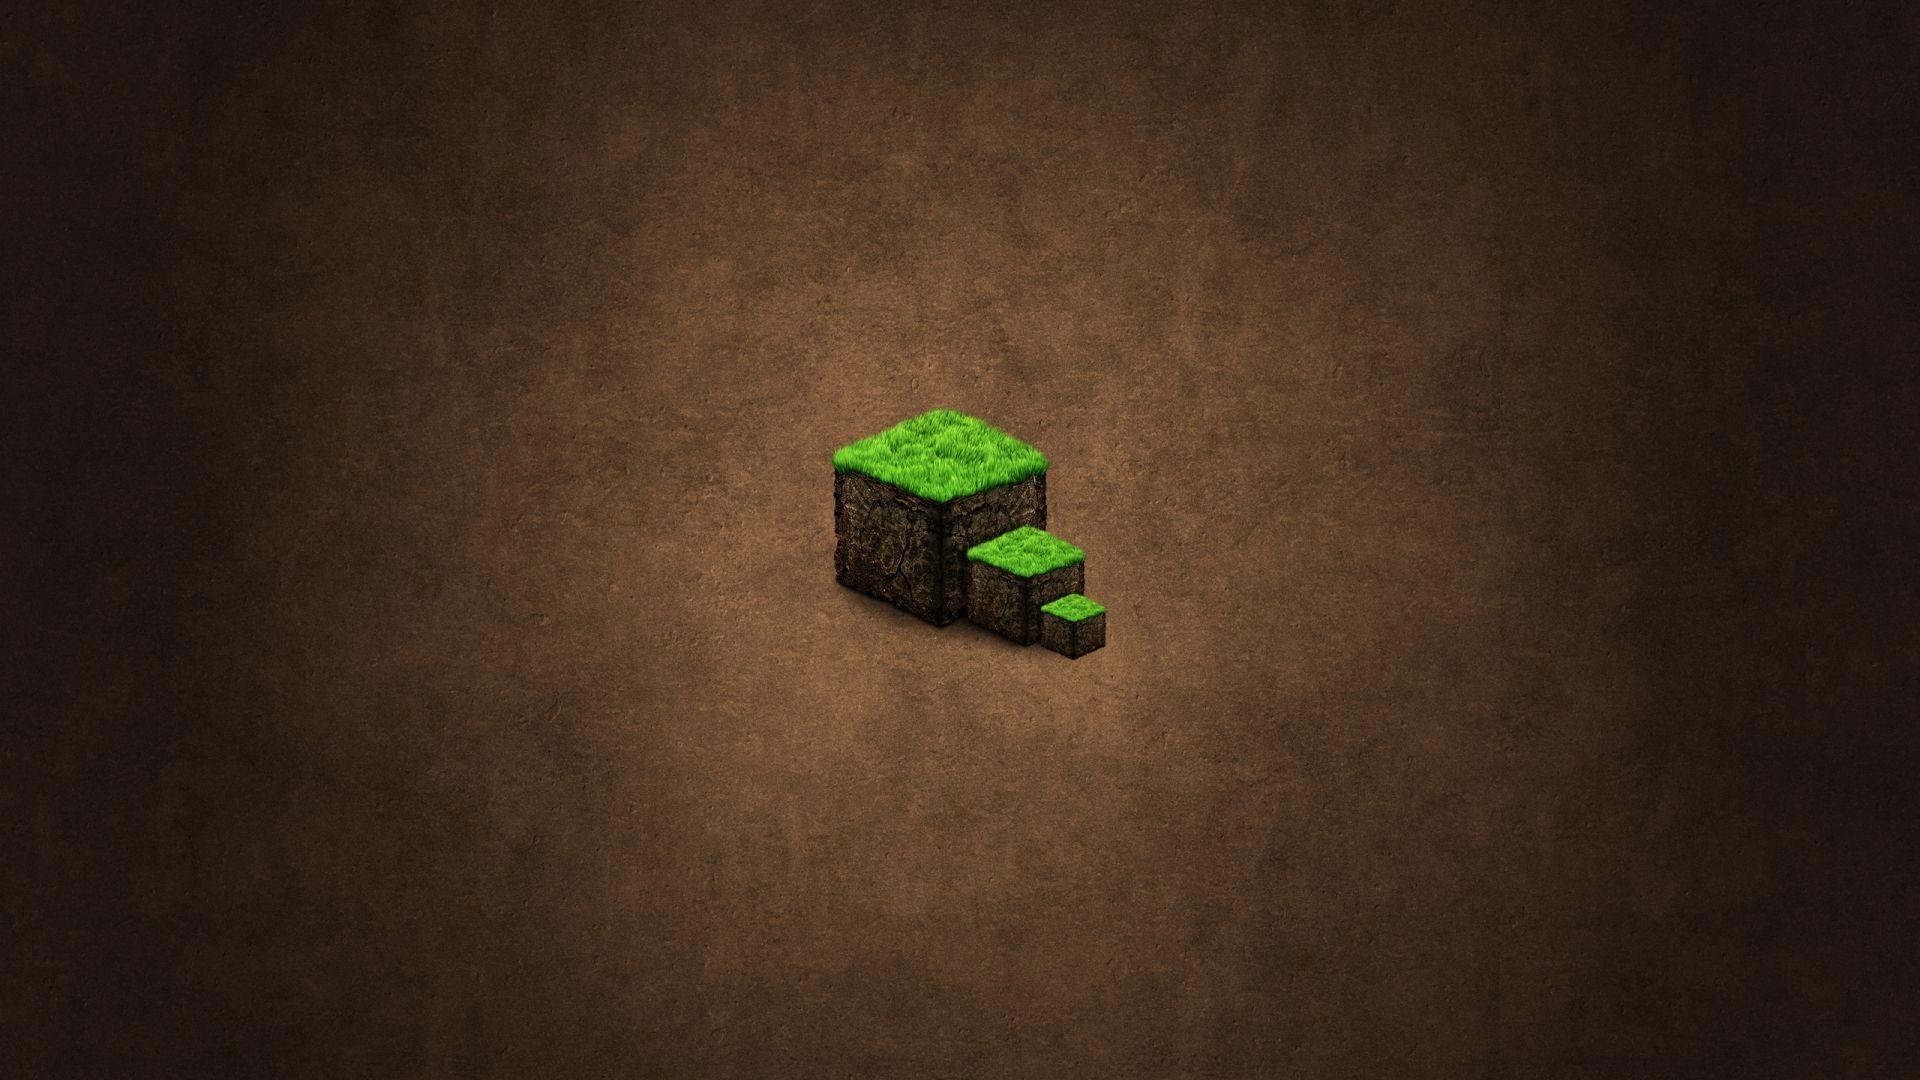 Beautiful Minecraft Ground Background Cube Wallpaper Kuff Games